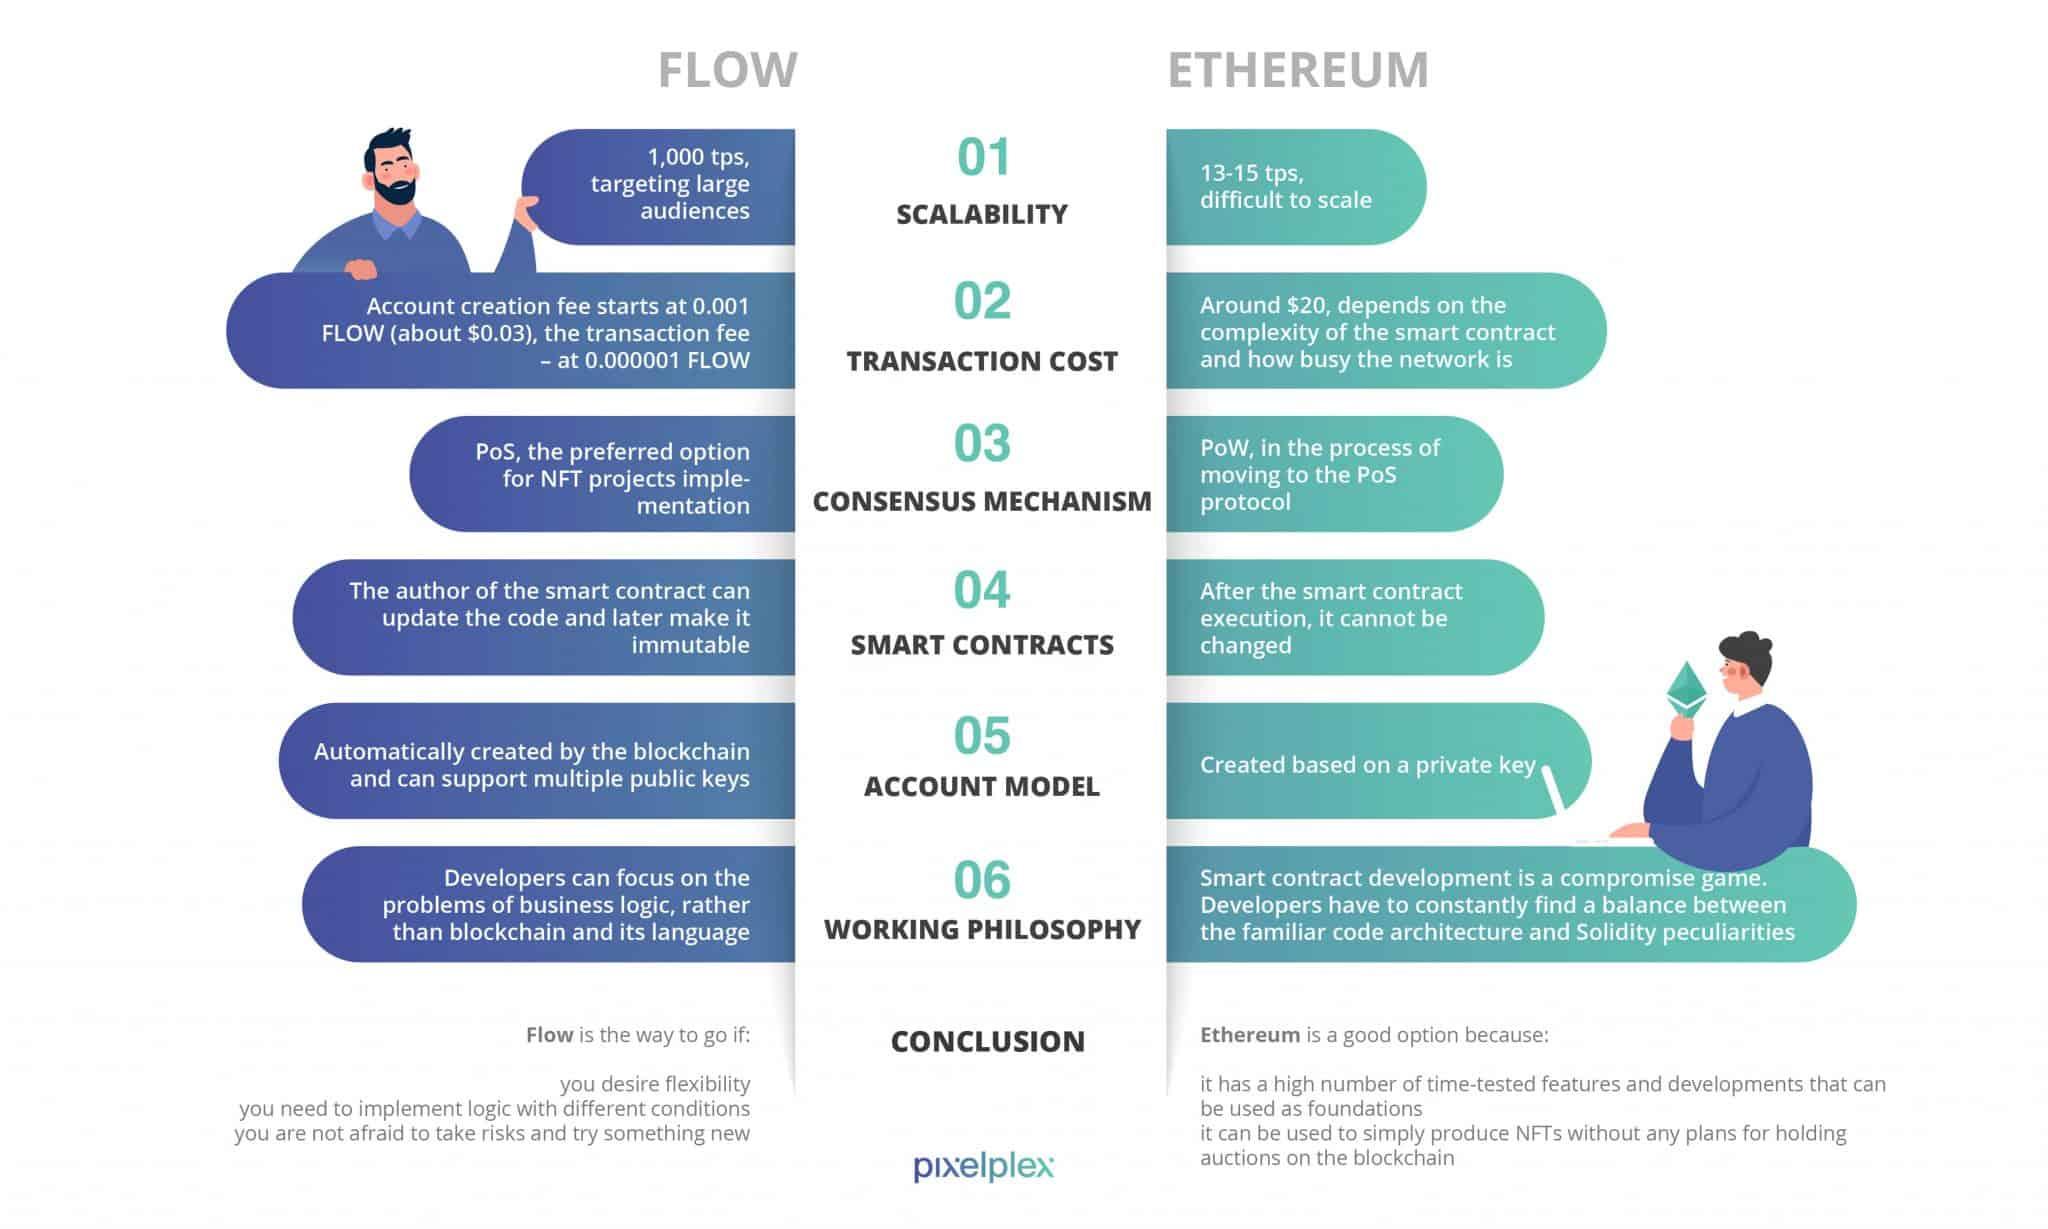 NFT Development Flow vs Ethereum